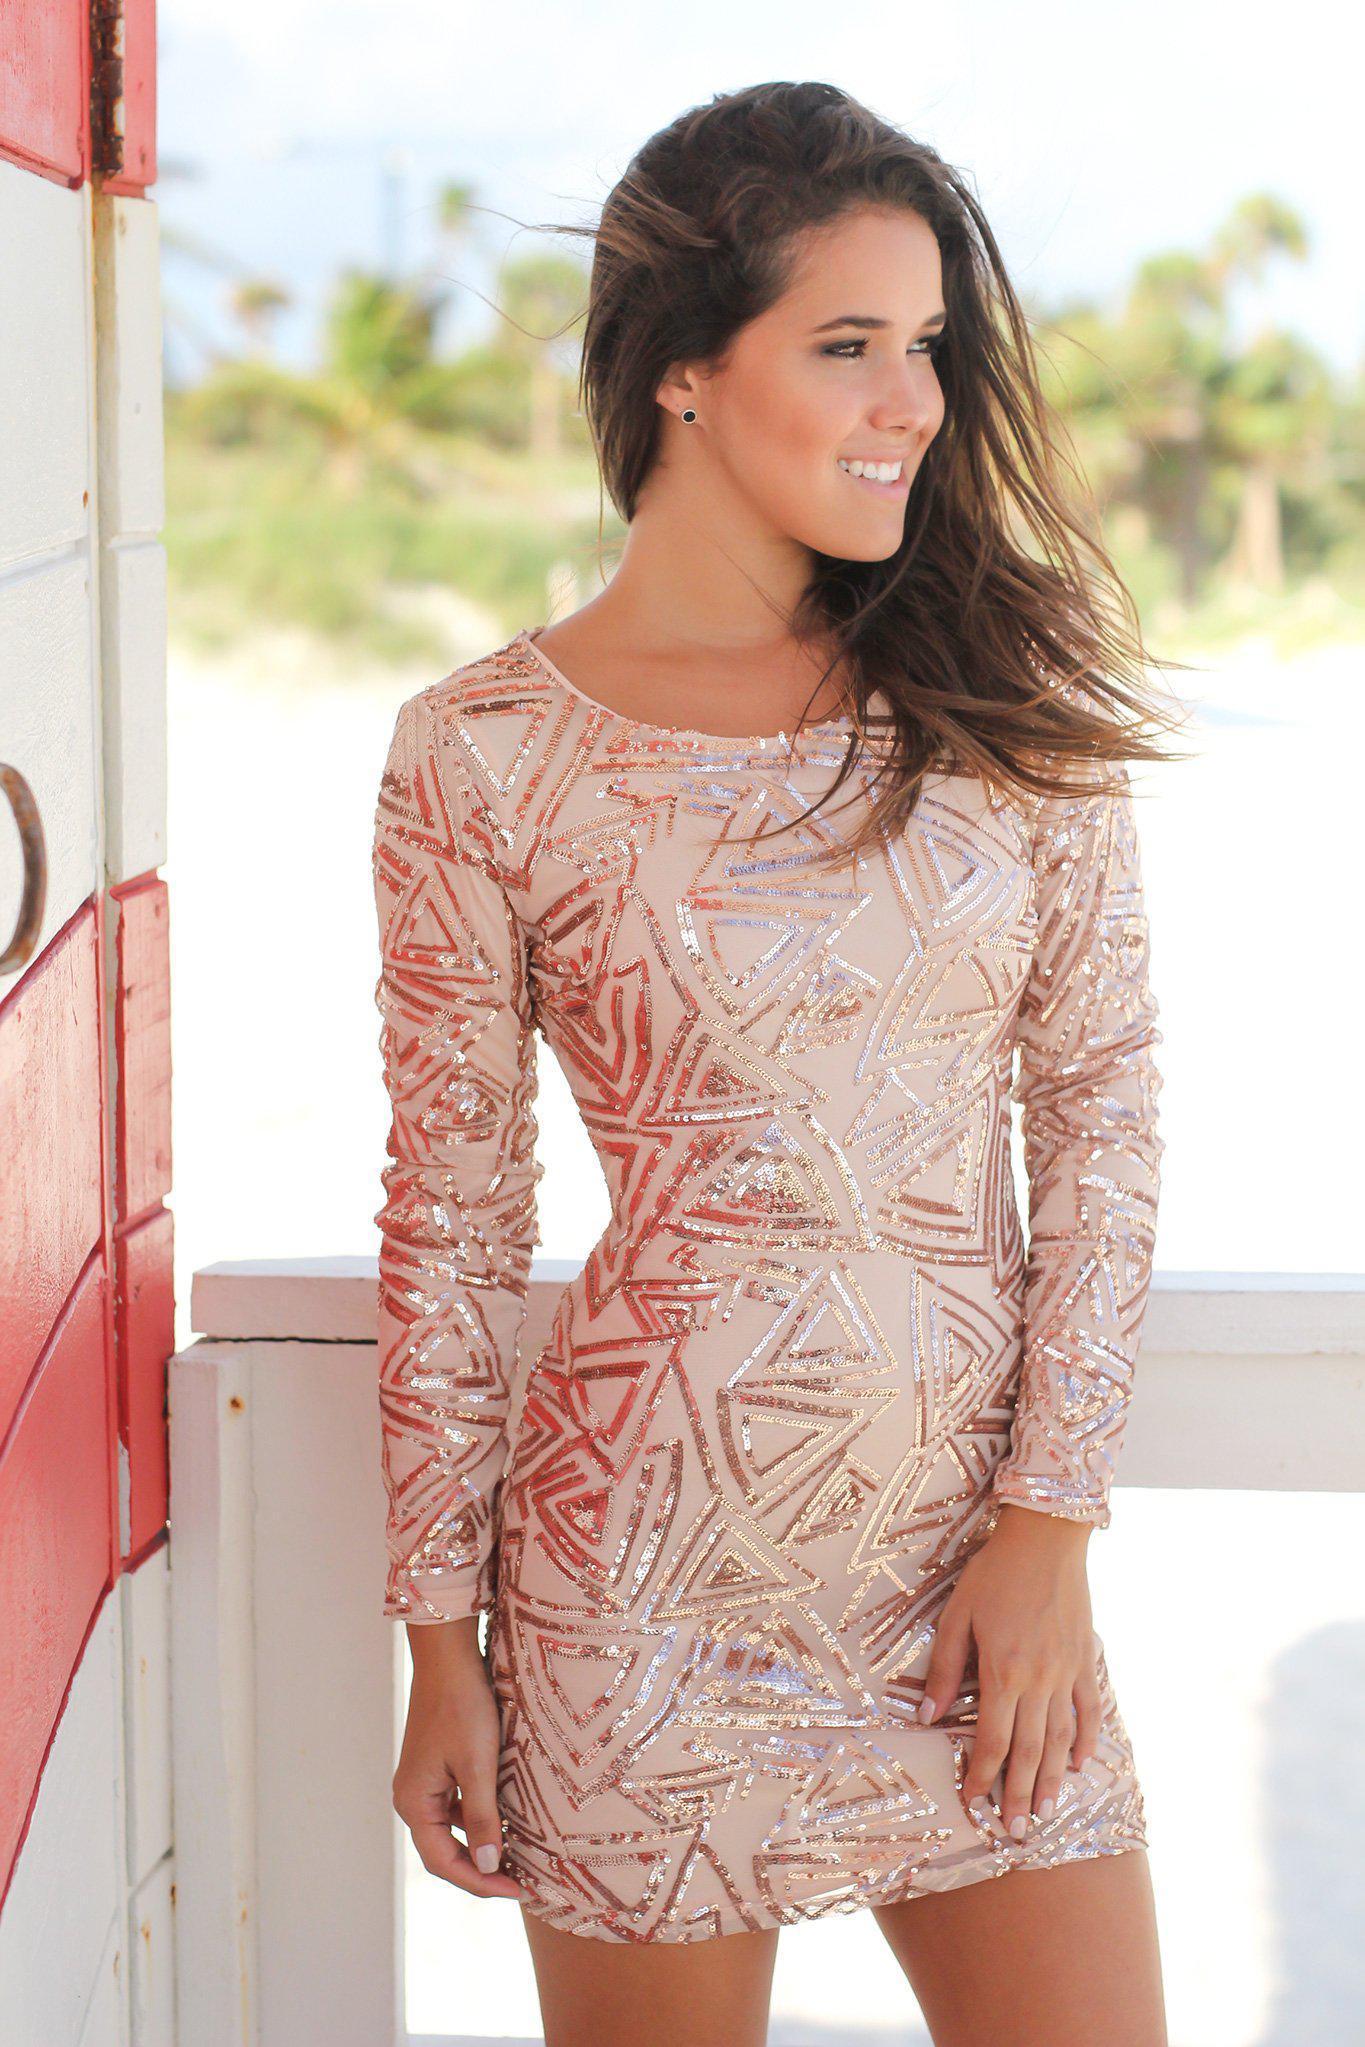 Rose Gold Sequin Short Dress With Long Sleeves Open Back Gold Long Sleeve Dress Rose Gold Dress Short Short Dresses